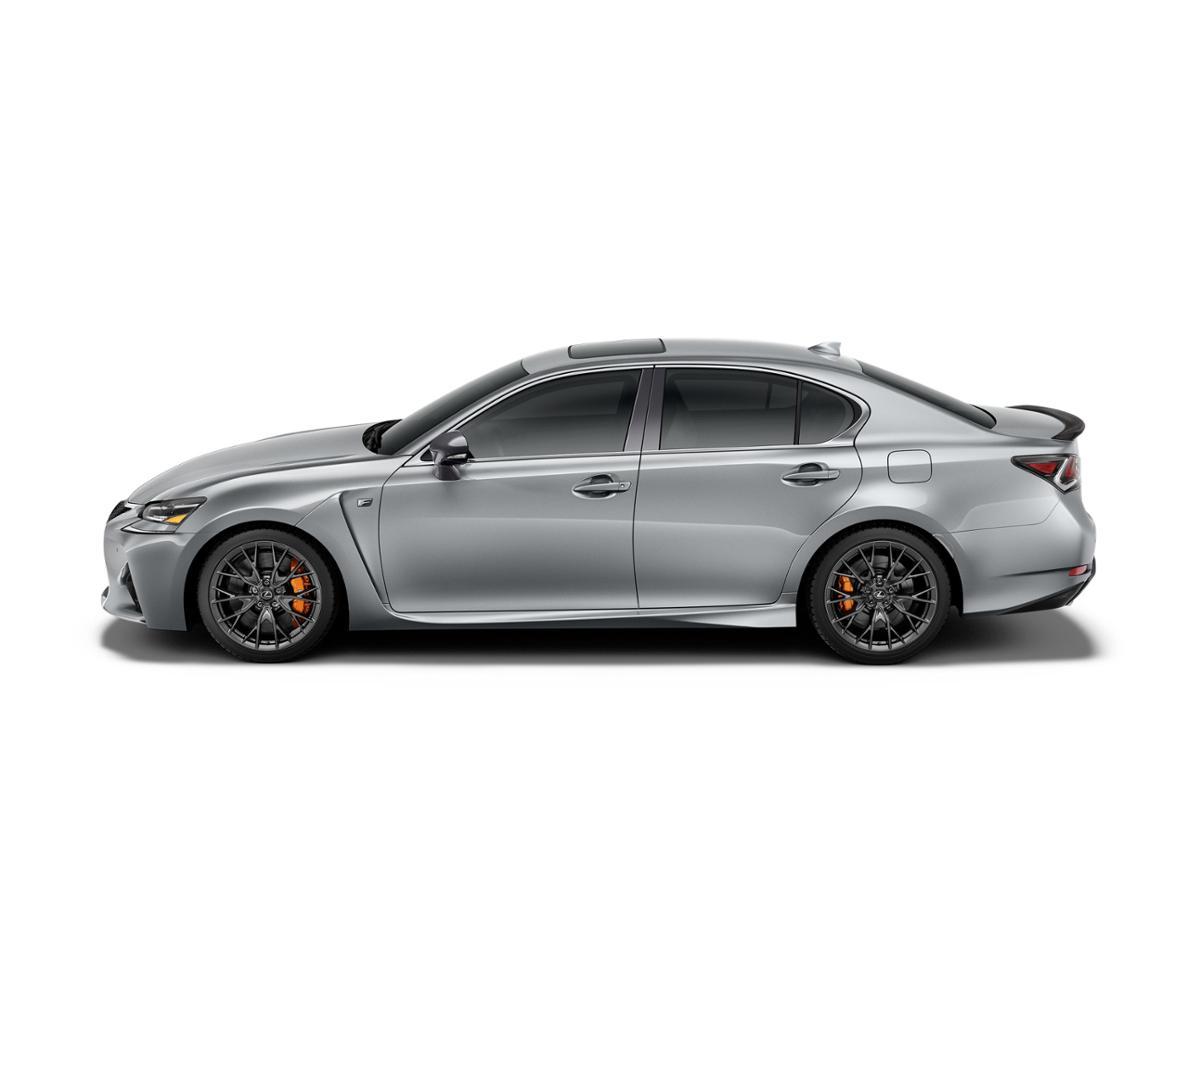 Lexus Gs Lease: Colorado Springs, CO